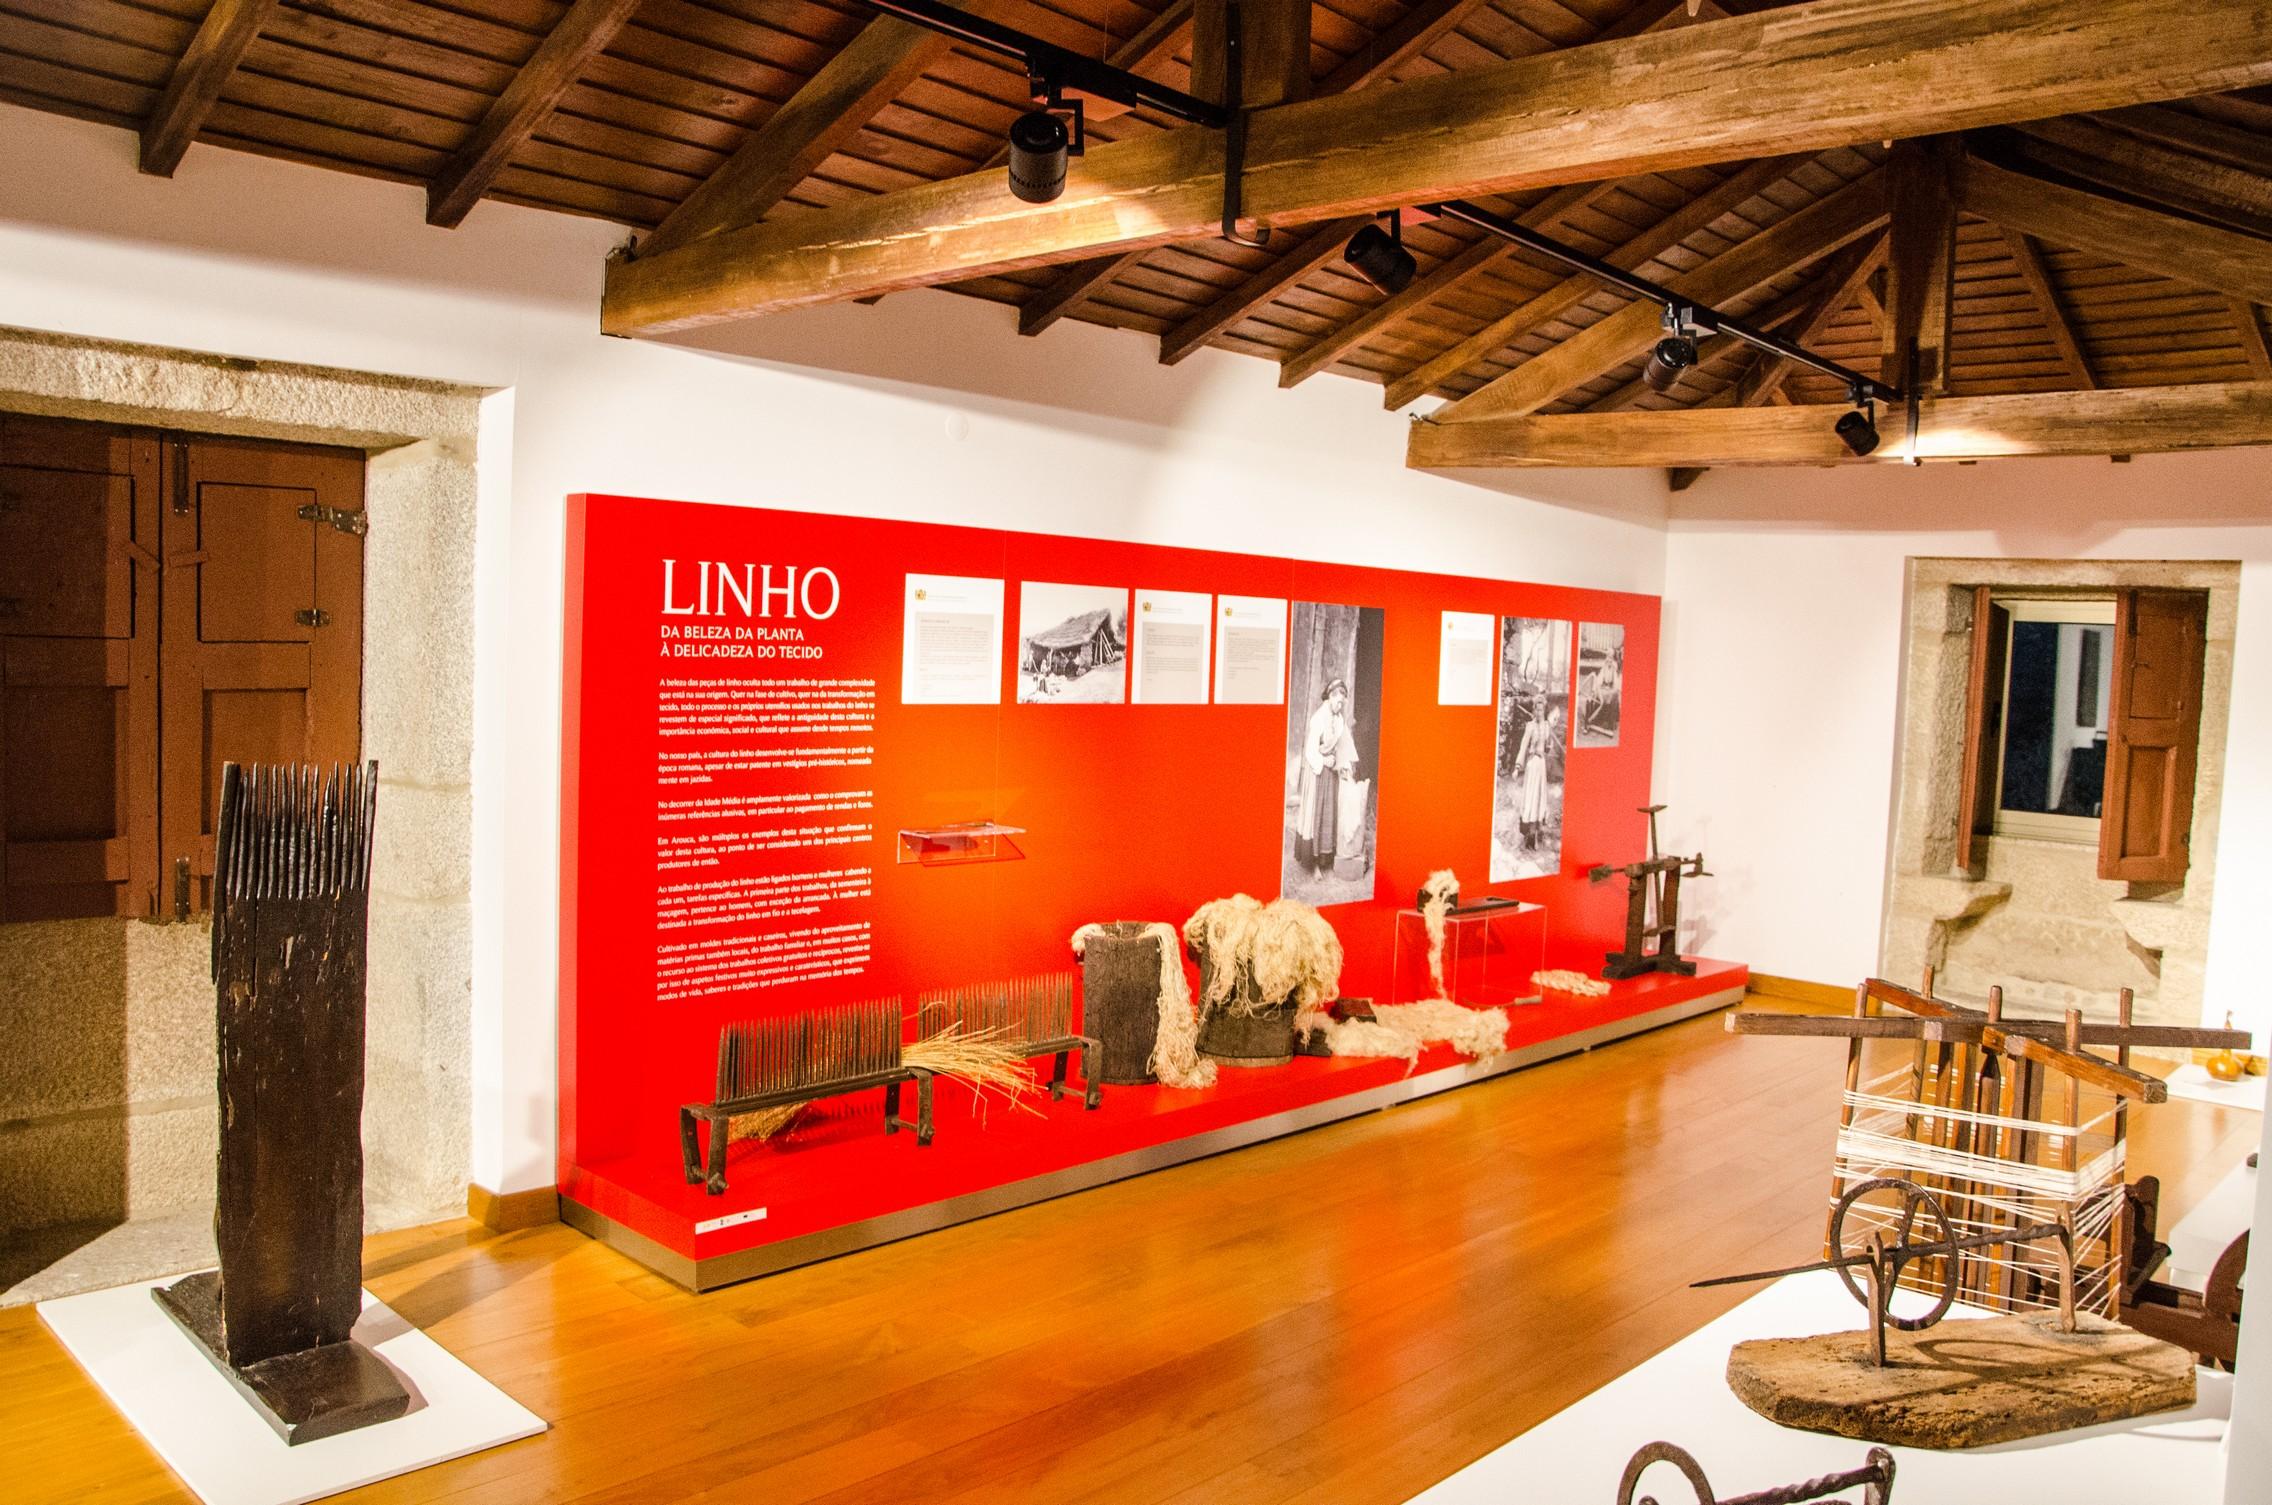 Museu de Urrô